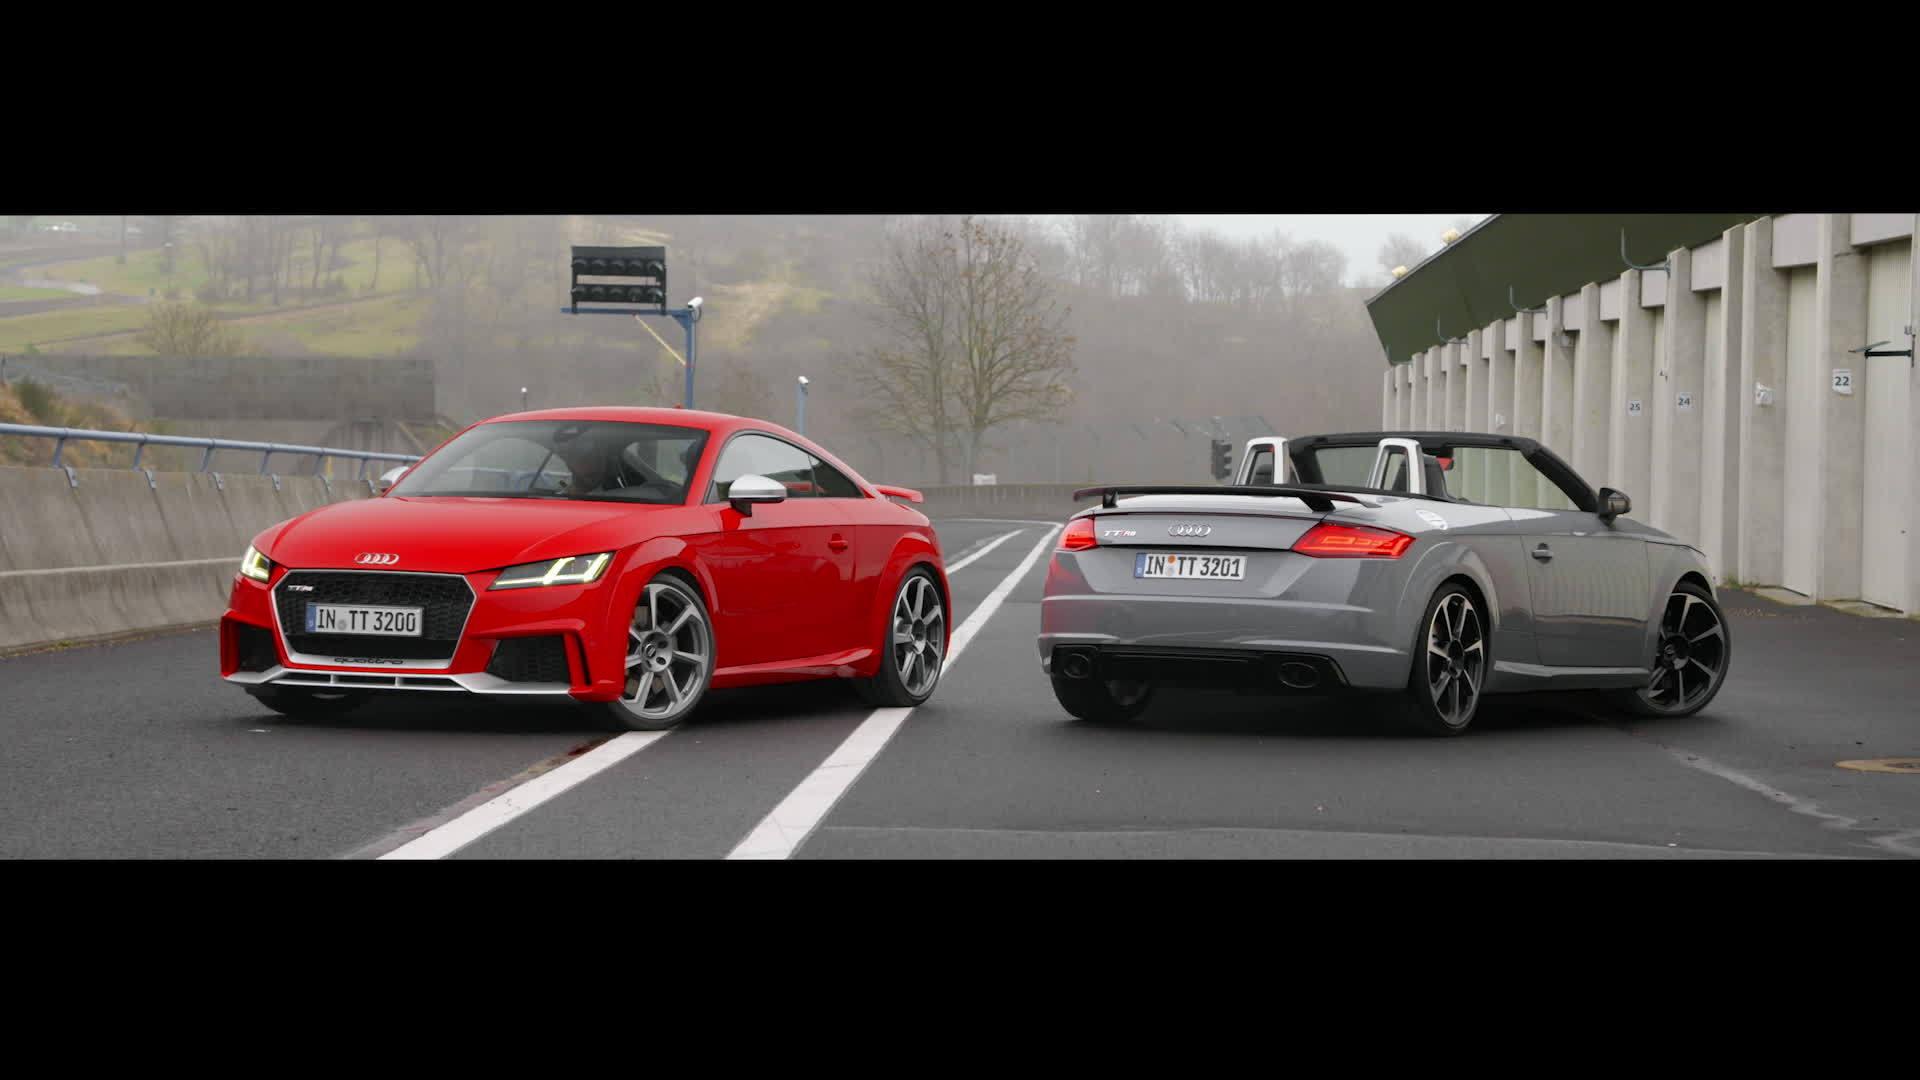 TT RS Coupé und TT RS Roadster - Fahrspaß auf höchstem Niveau